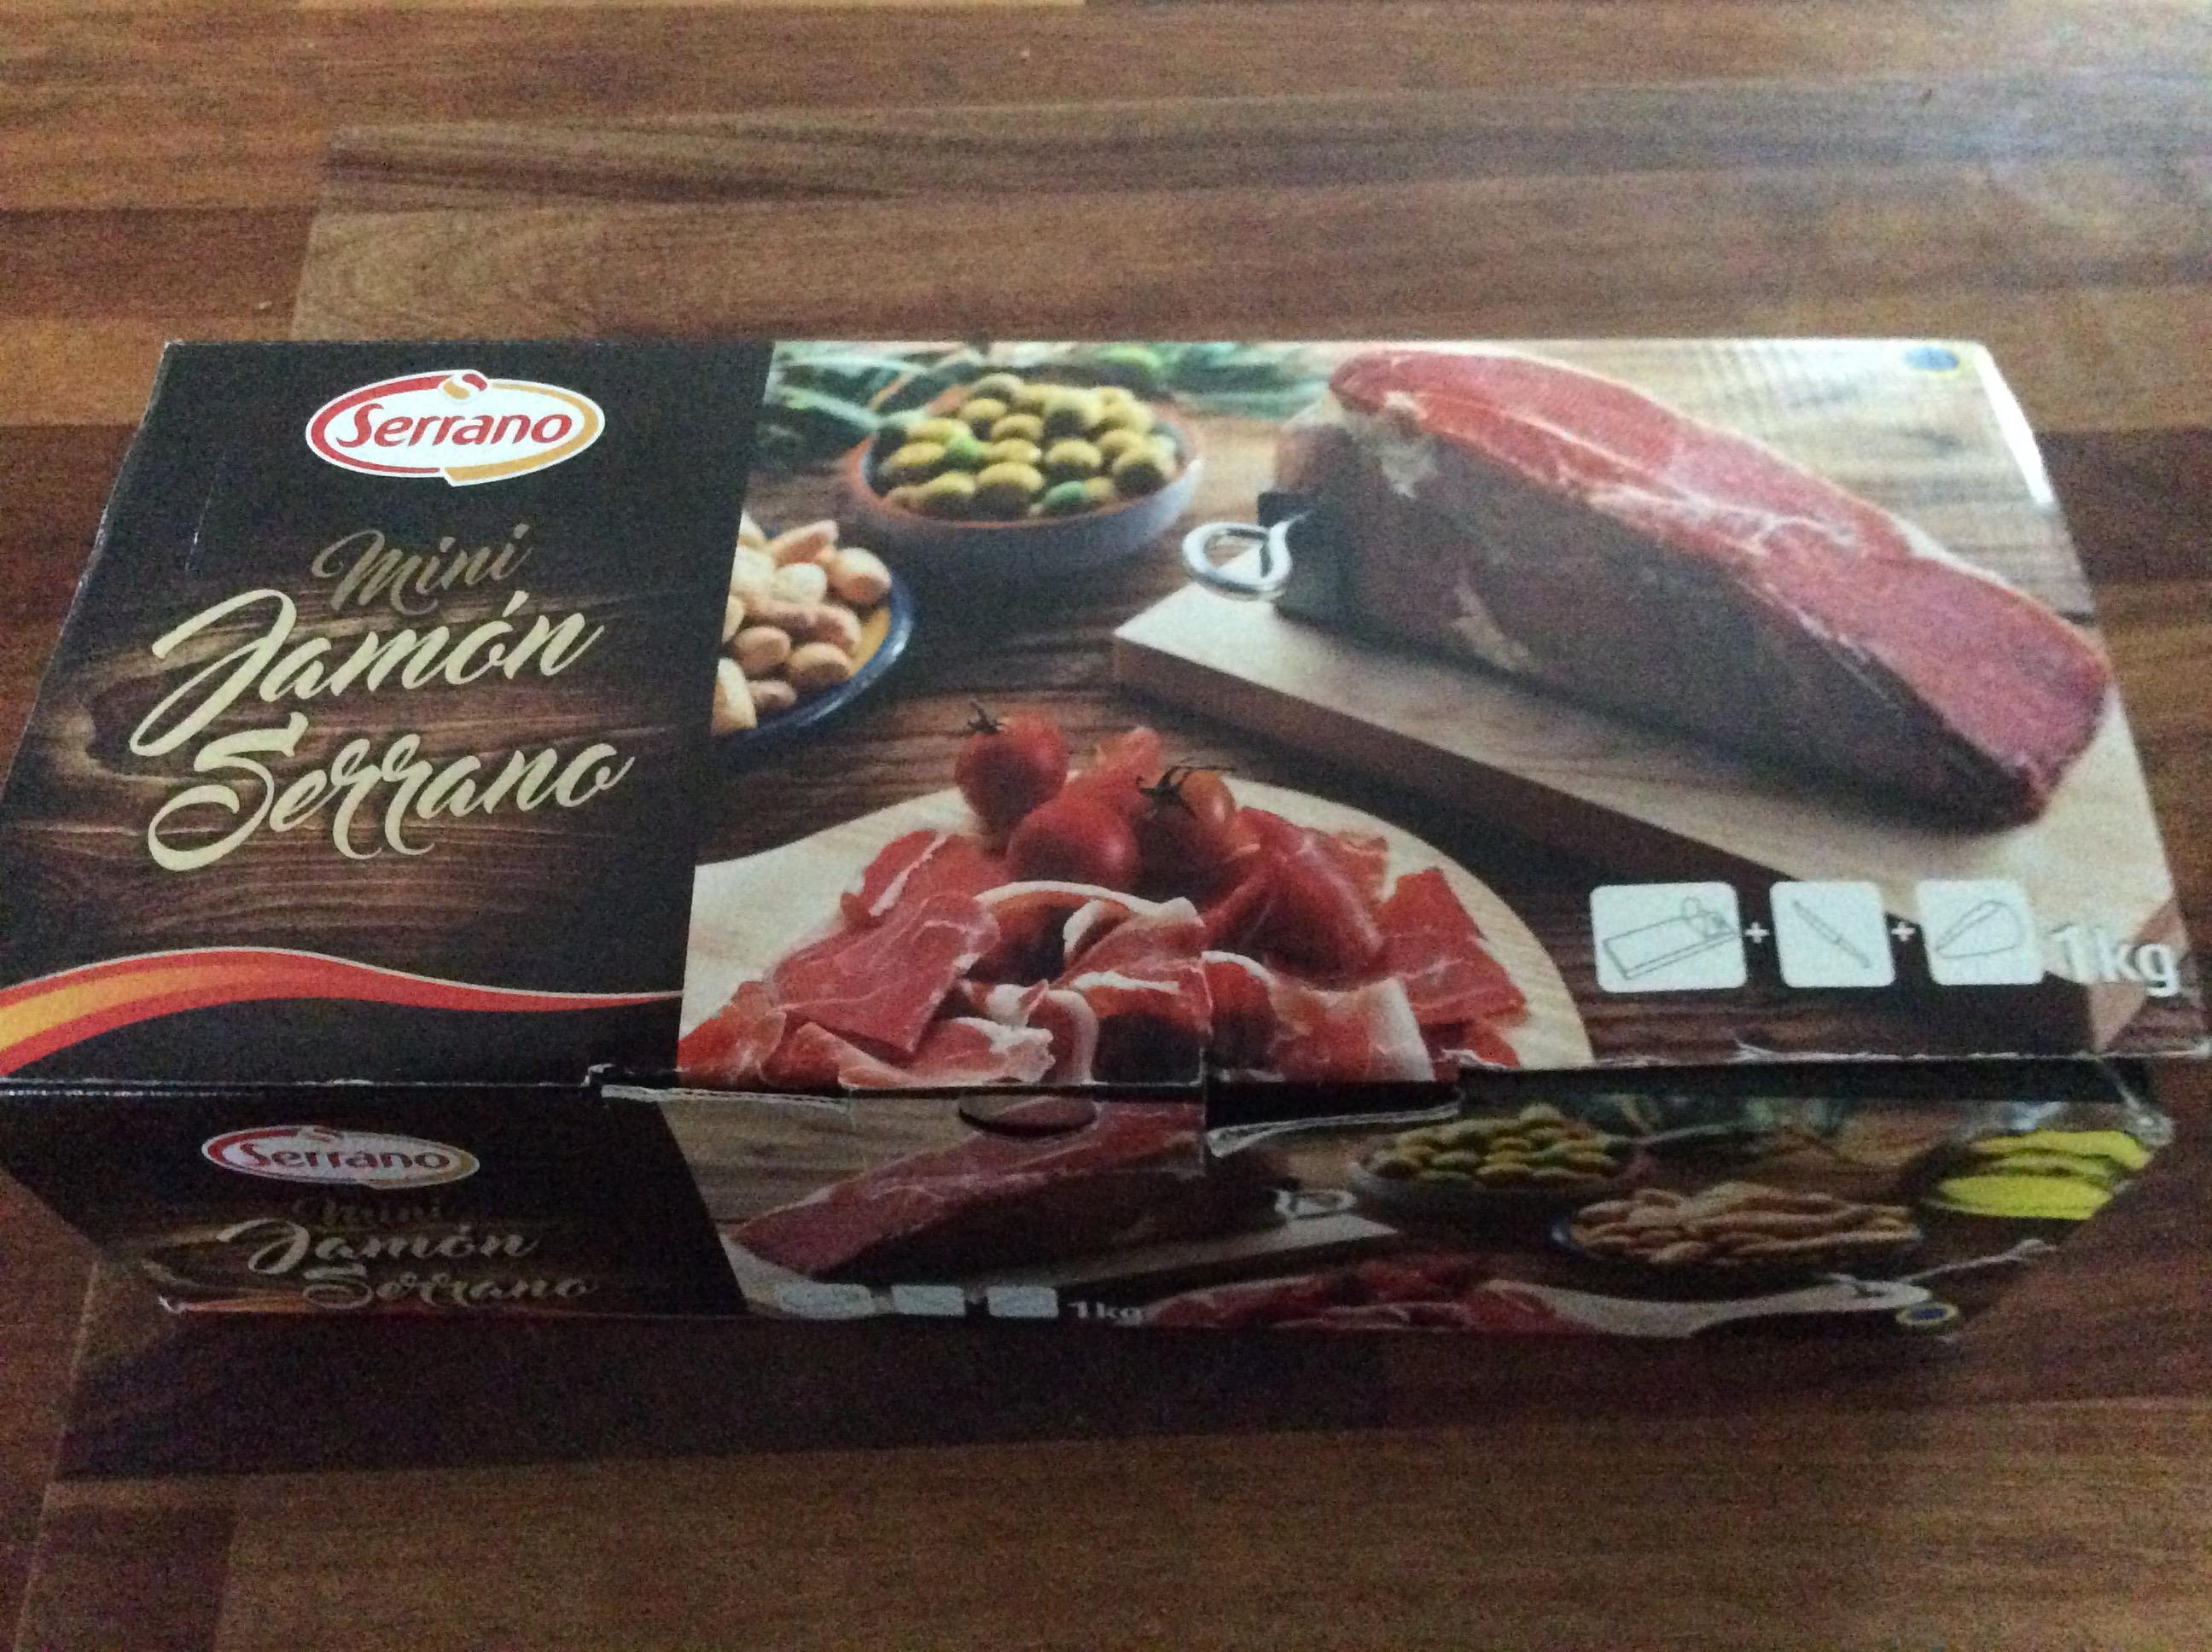 Iceland Serrano Ham small 1kg - £5 instore